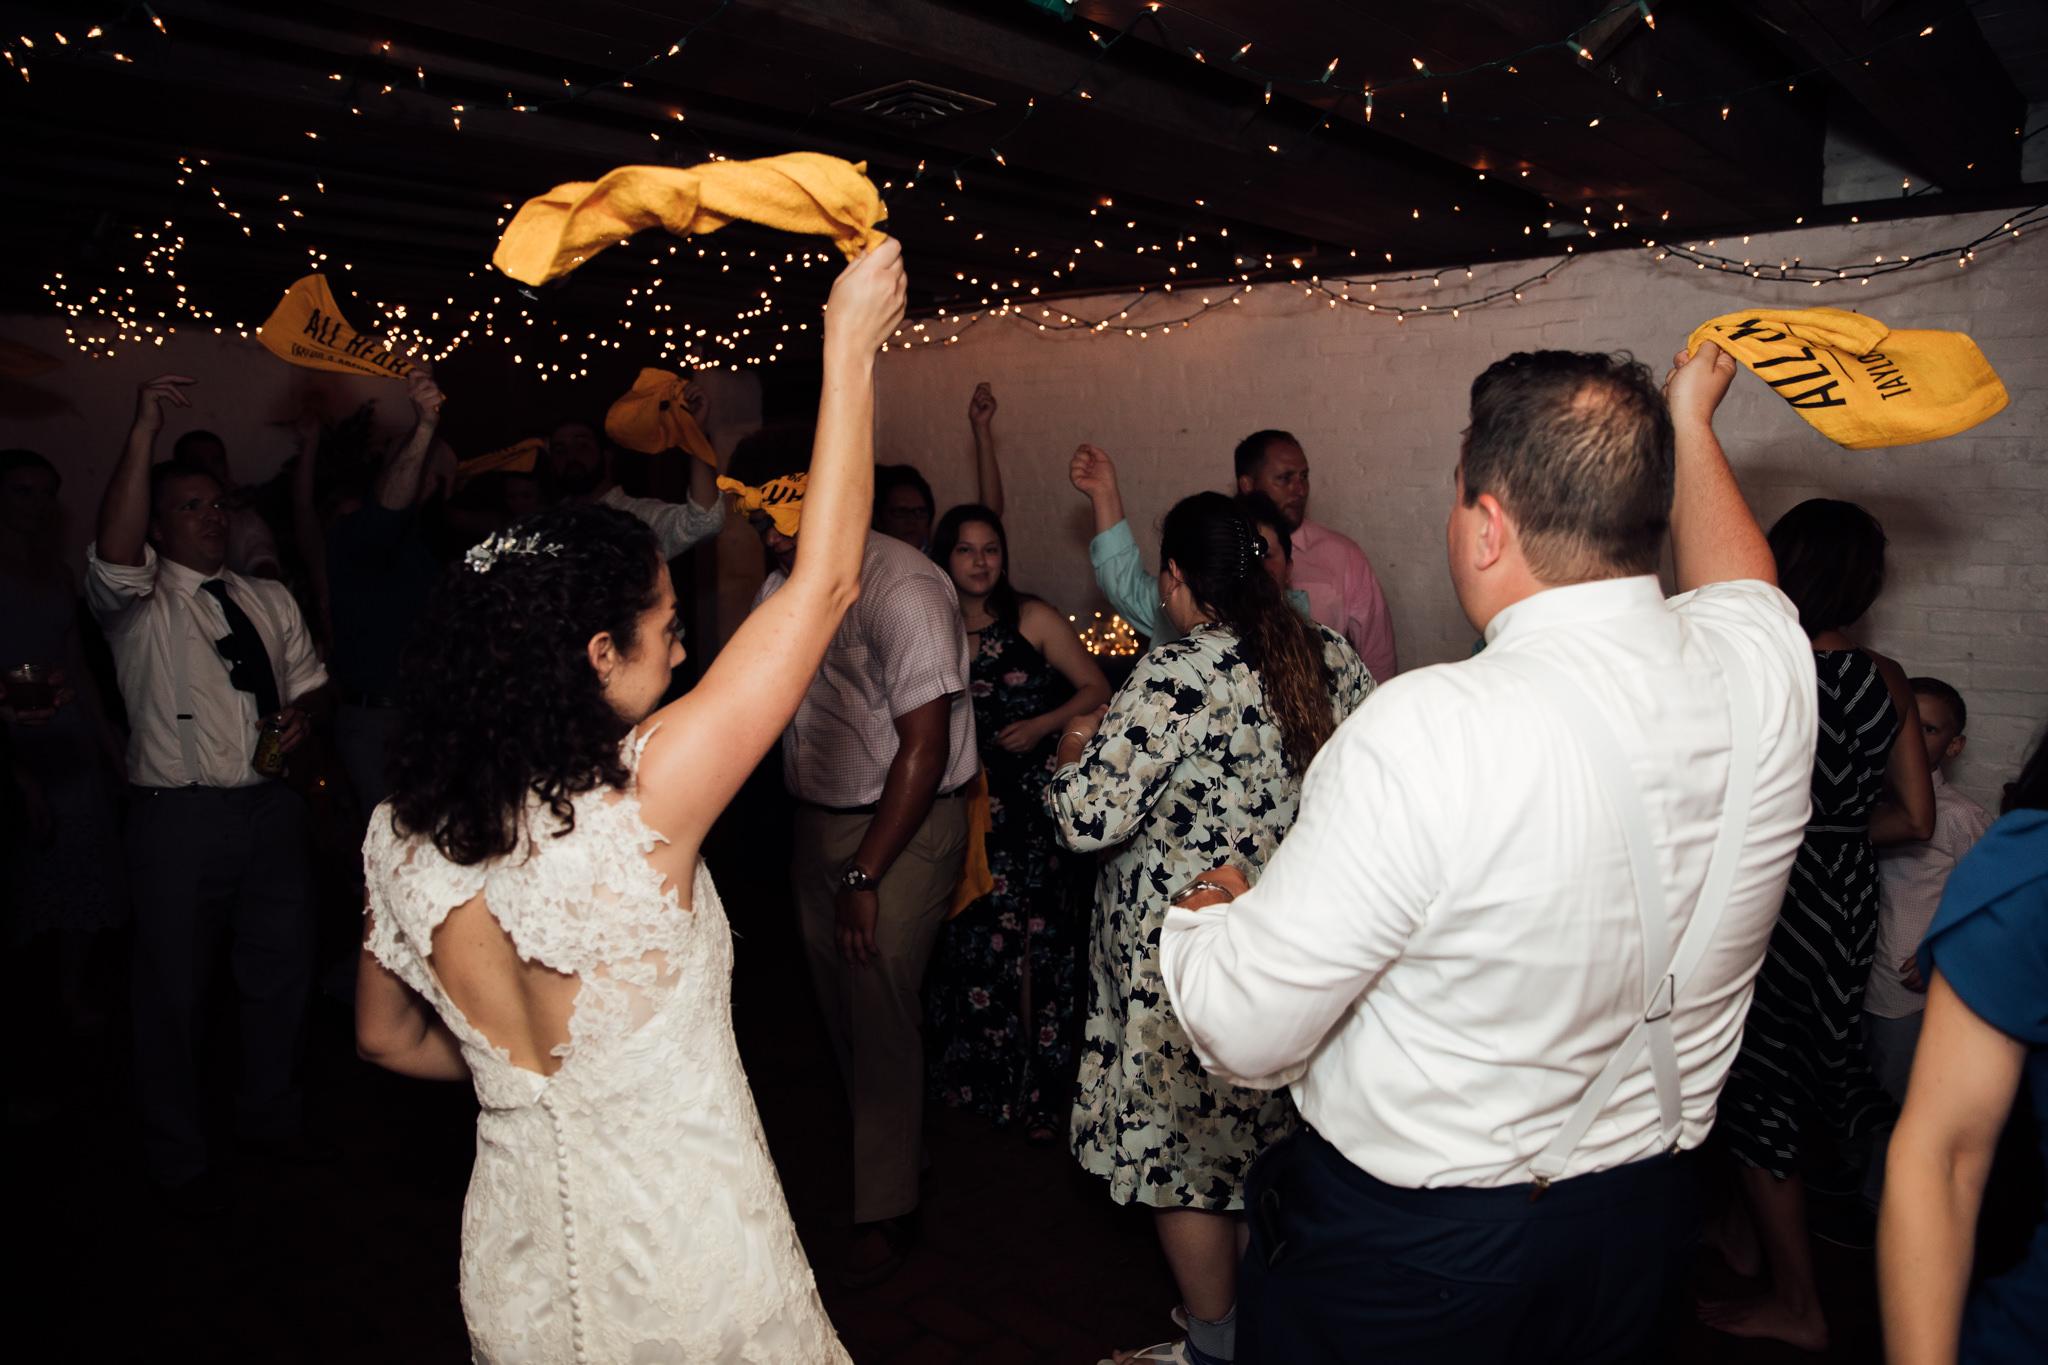 woodruff-fontaine-wedding-venue-memphis-thewarmtharoundyou-brenda-taylor-57.jpg